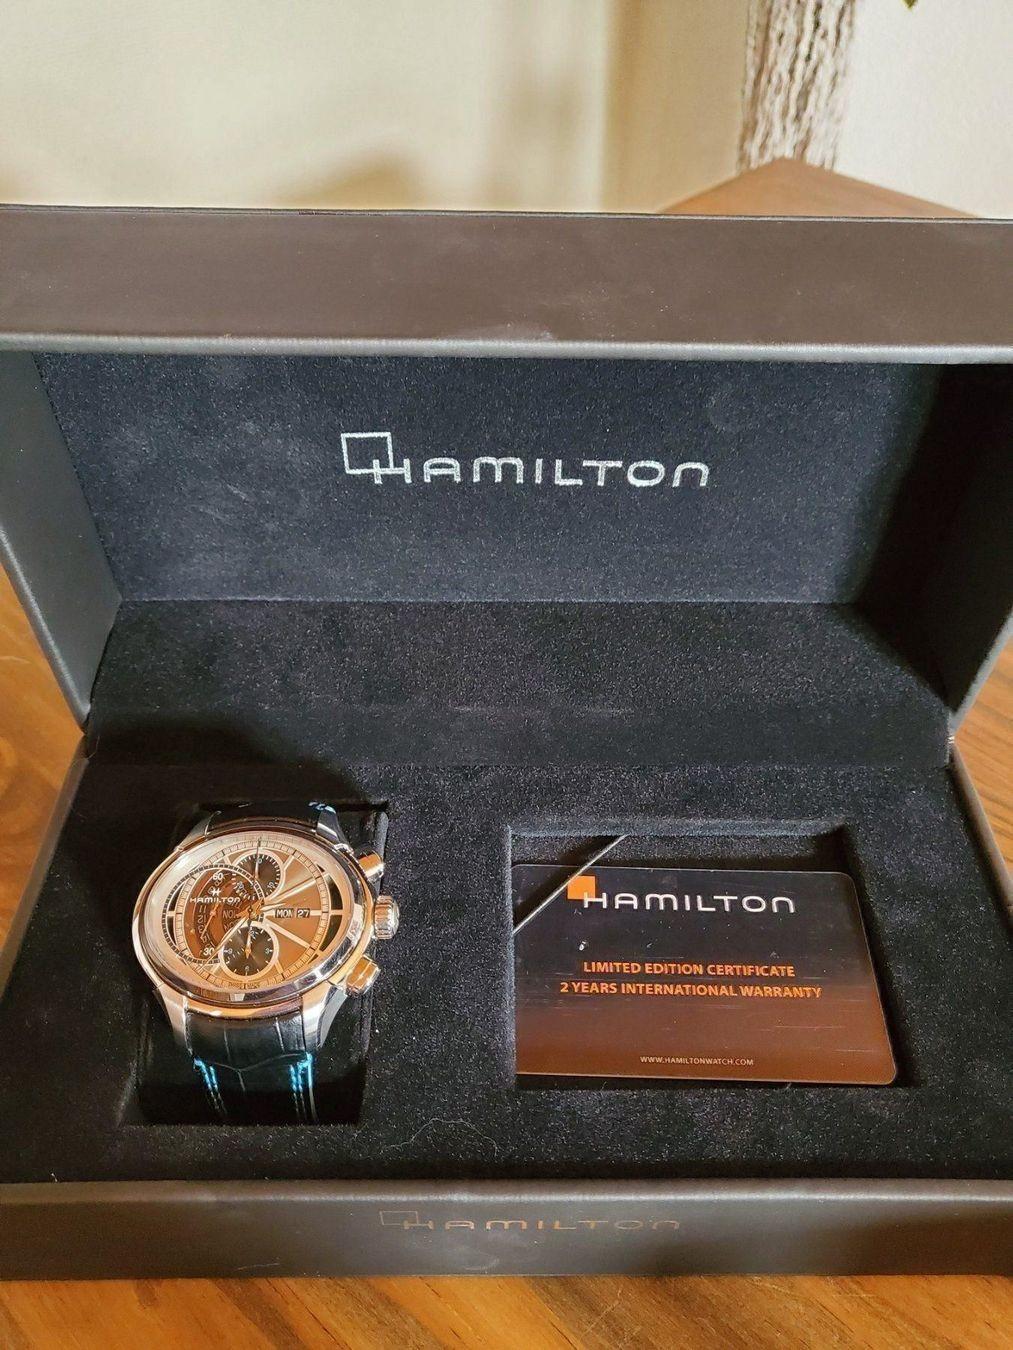 Hamilton / Jazzmaster Face2Face II - Gentlemen's Steel Wrist Watch - Image 4 of 13